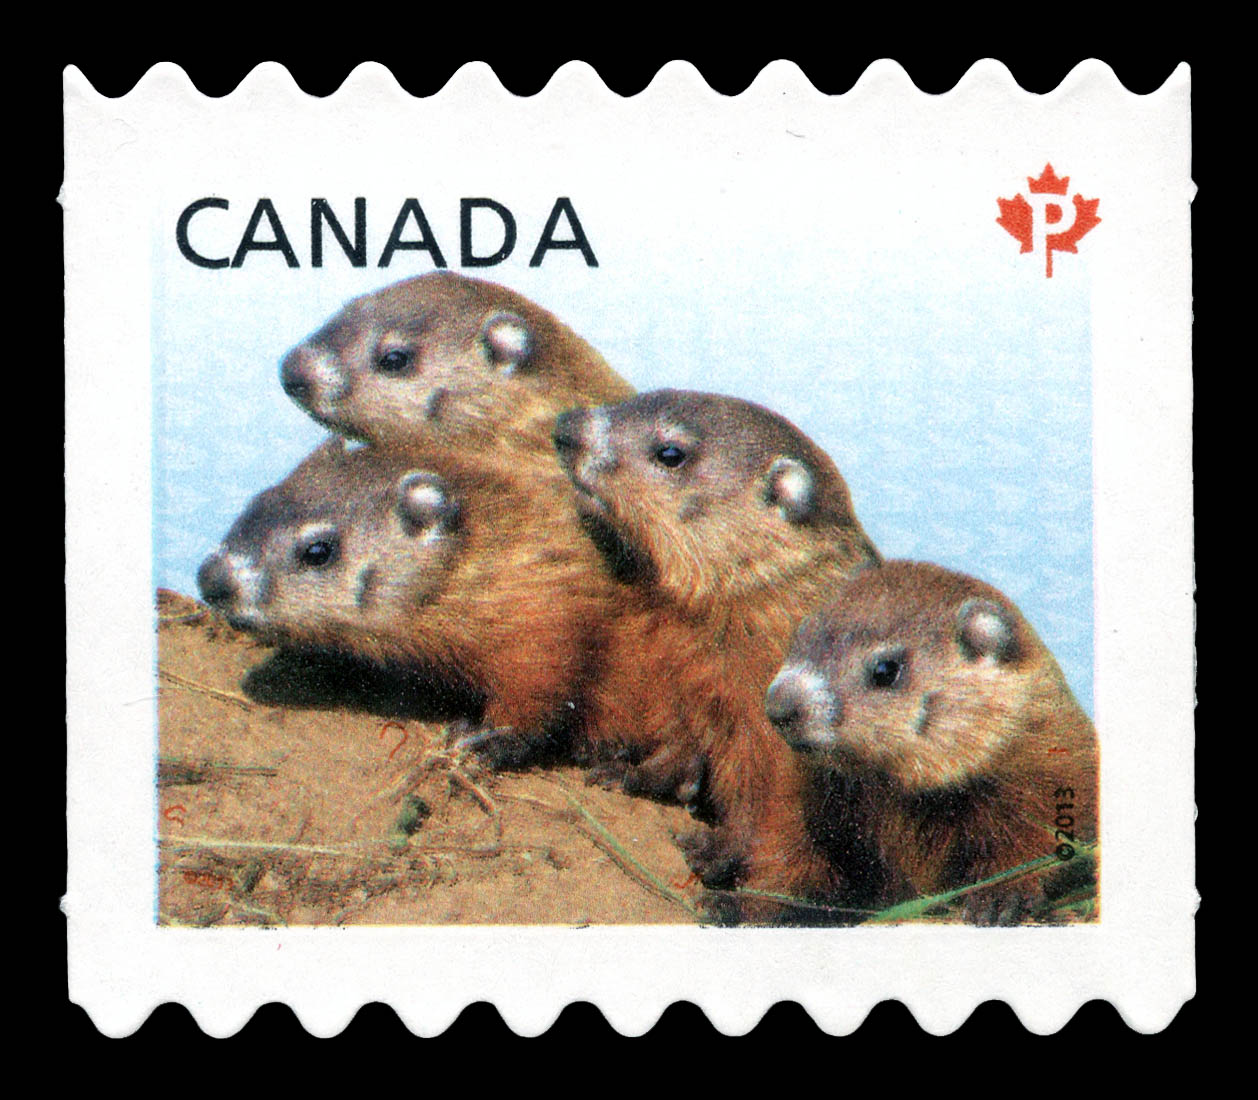 Woodchucks - Baby Wildlife Canada Postage Stamp | Baby Wildlife - Definitives